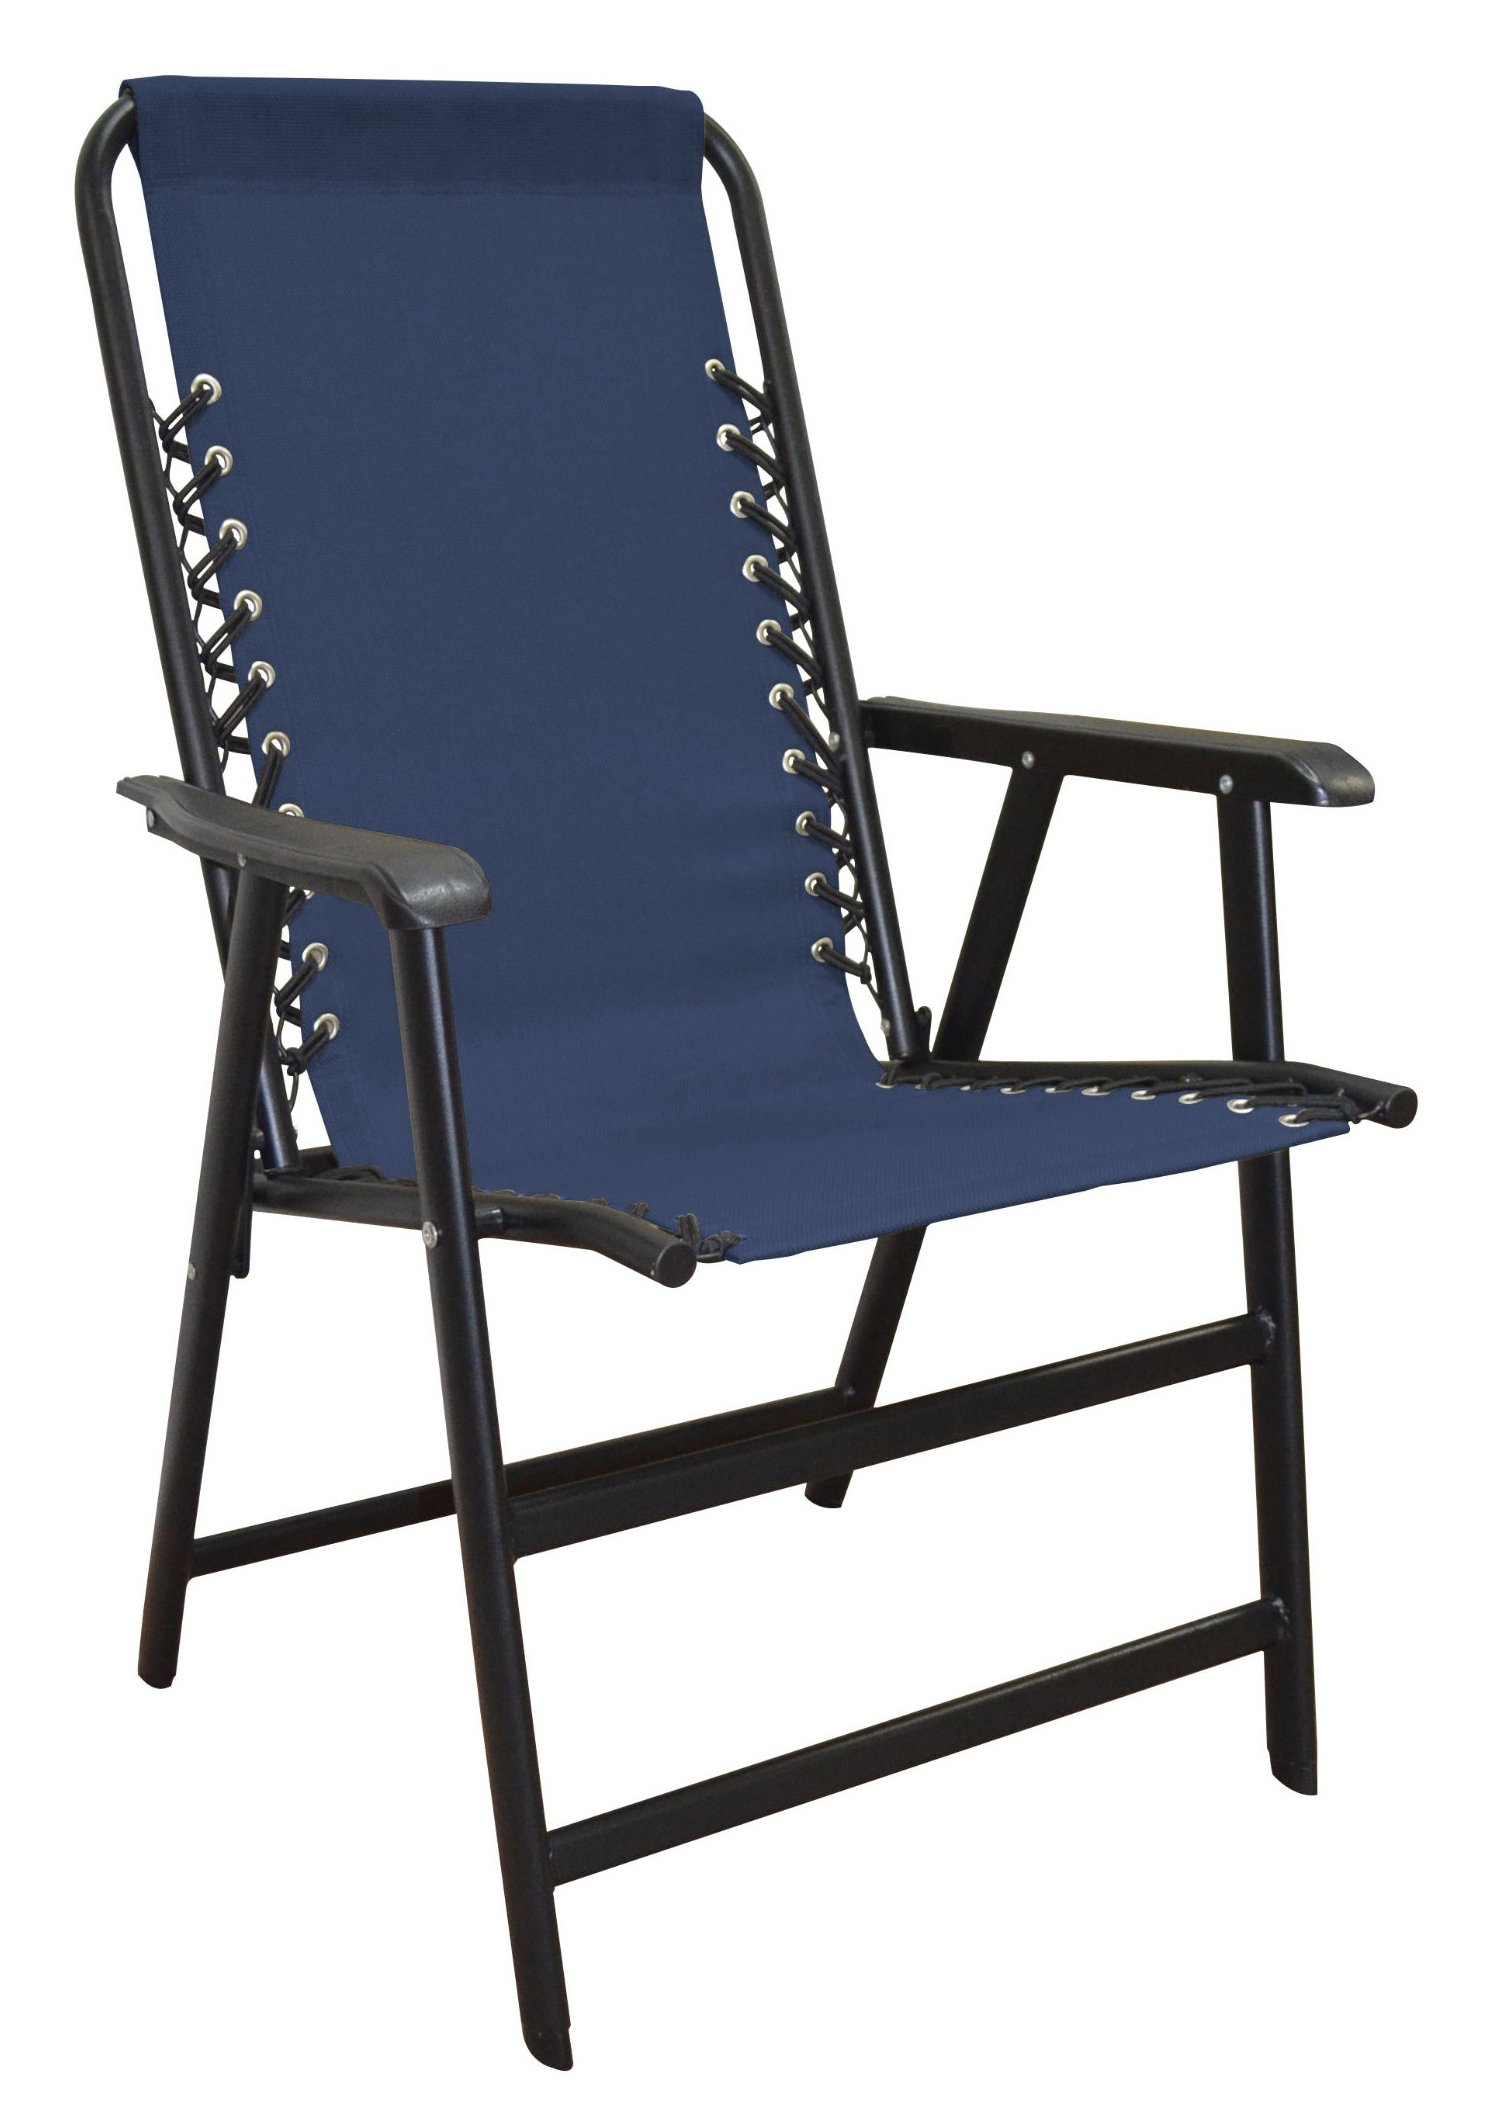 Caravan Sports Suspension Folding Chair, Blue by Caravan Sports